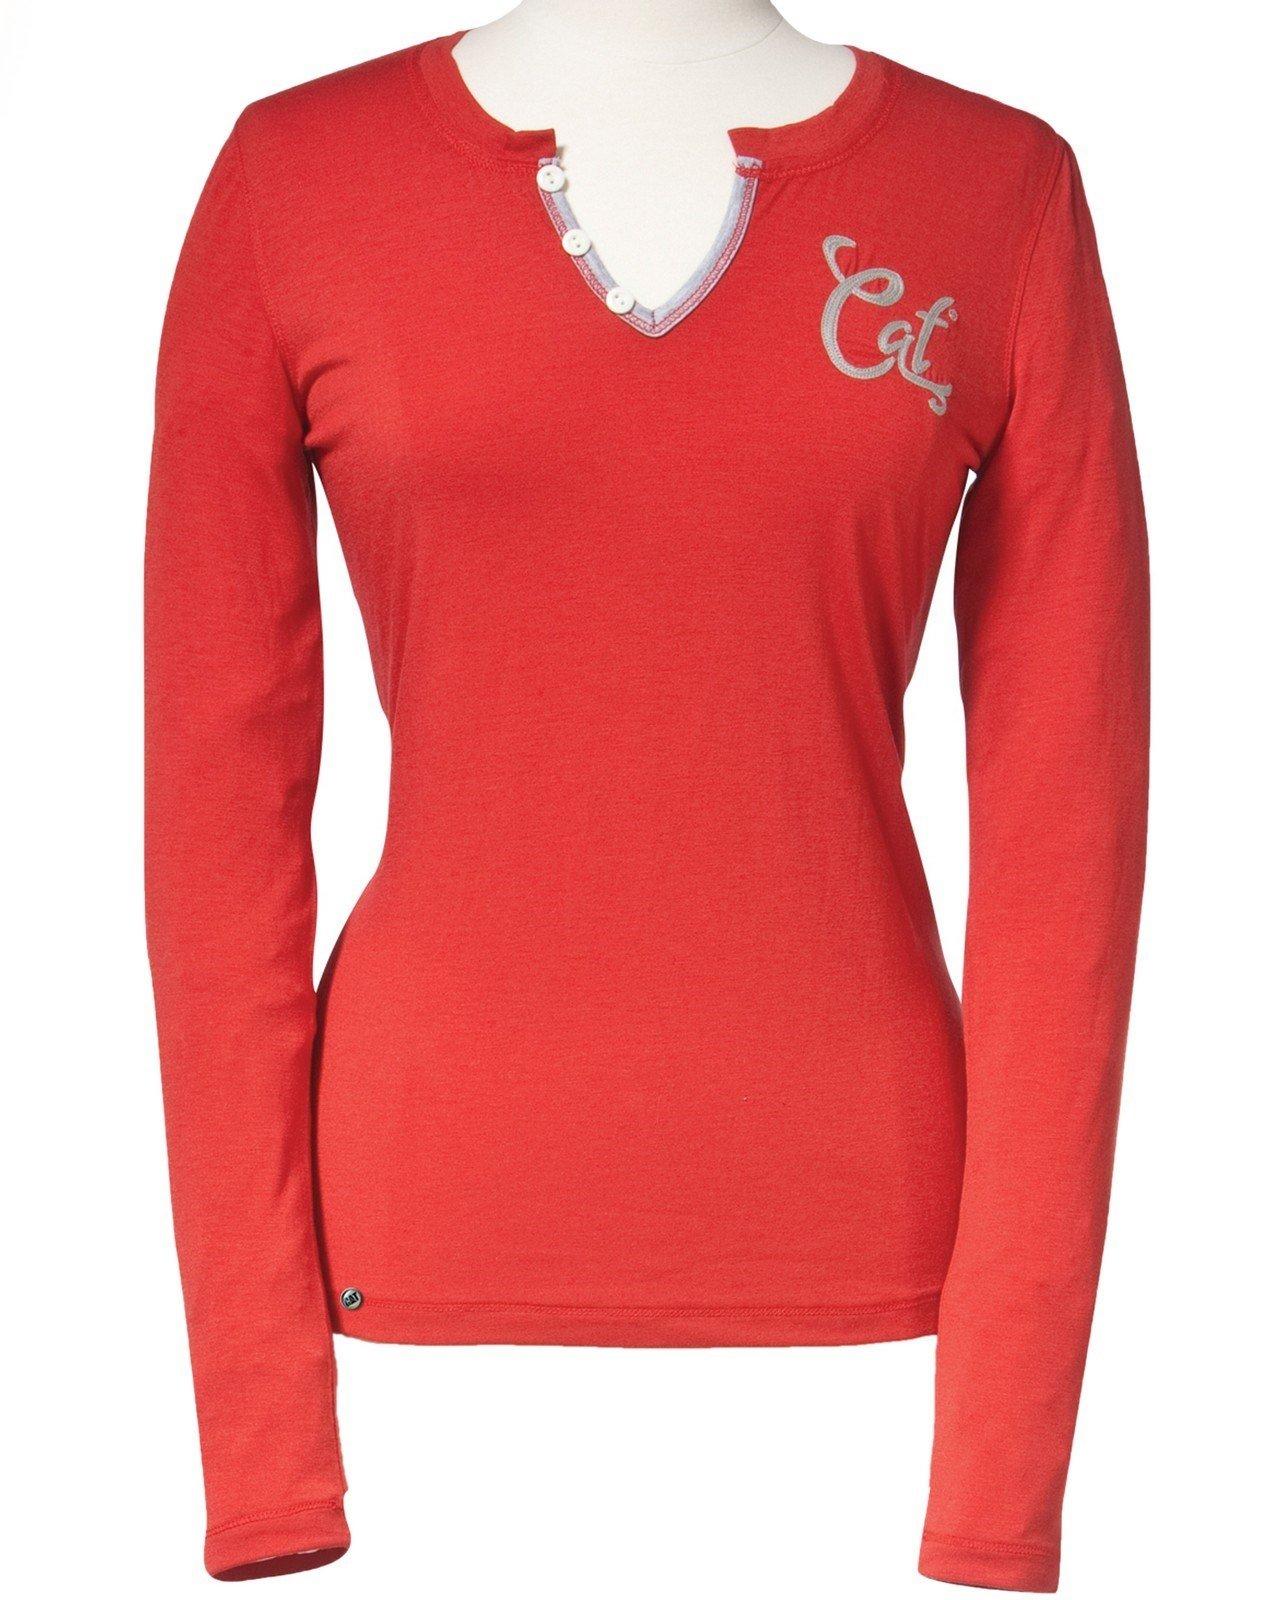 Caterpillar Women's Signature LS T-Shirt Gerani 20775 - Gerani Xsl